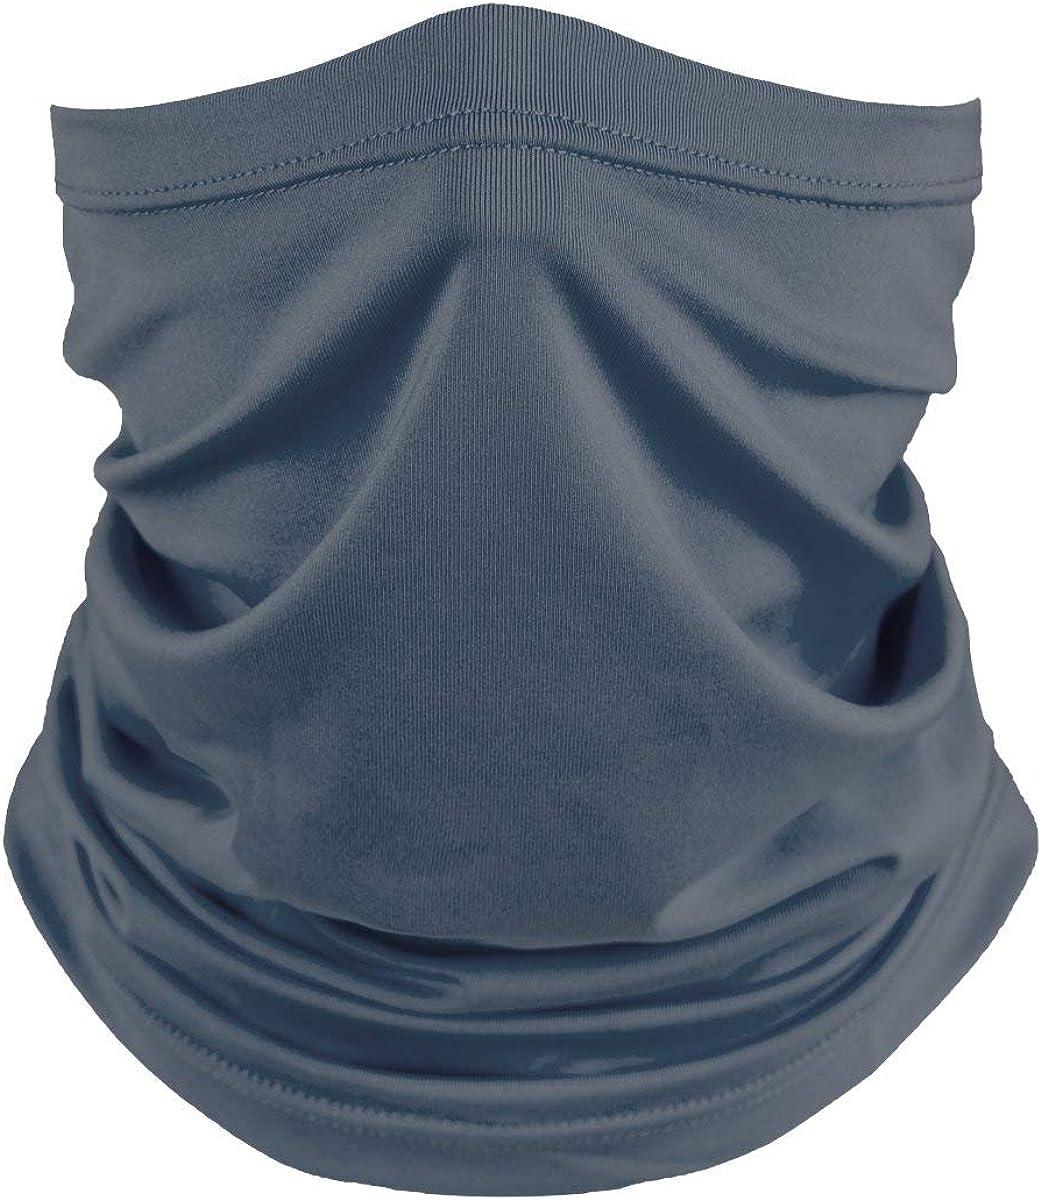 Willit Neck Gaiters Face Mask Reusable Cover Balaclava Bandana Cloth Face Mask Sun Dust Protection Washable